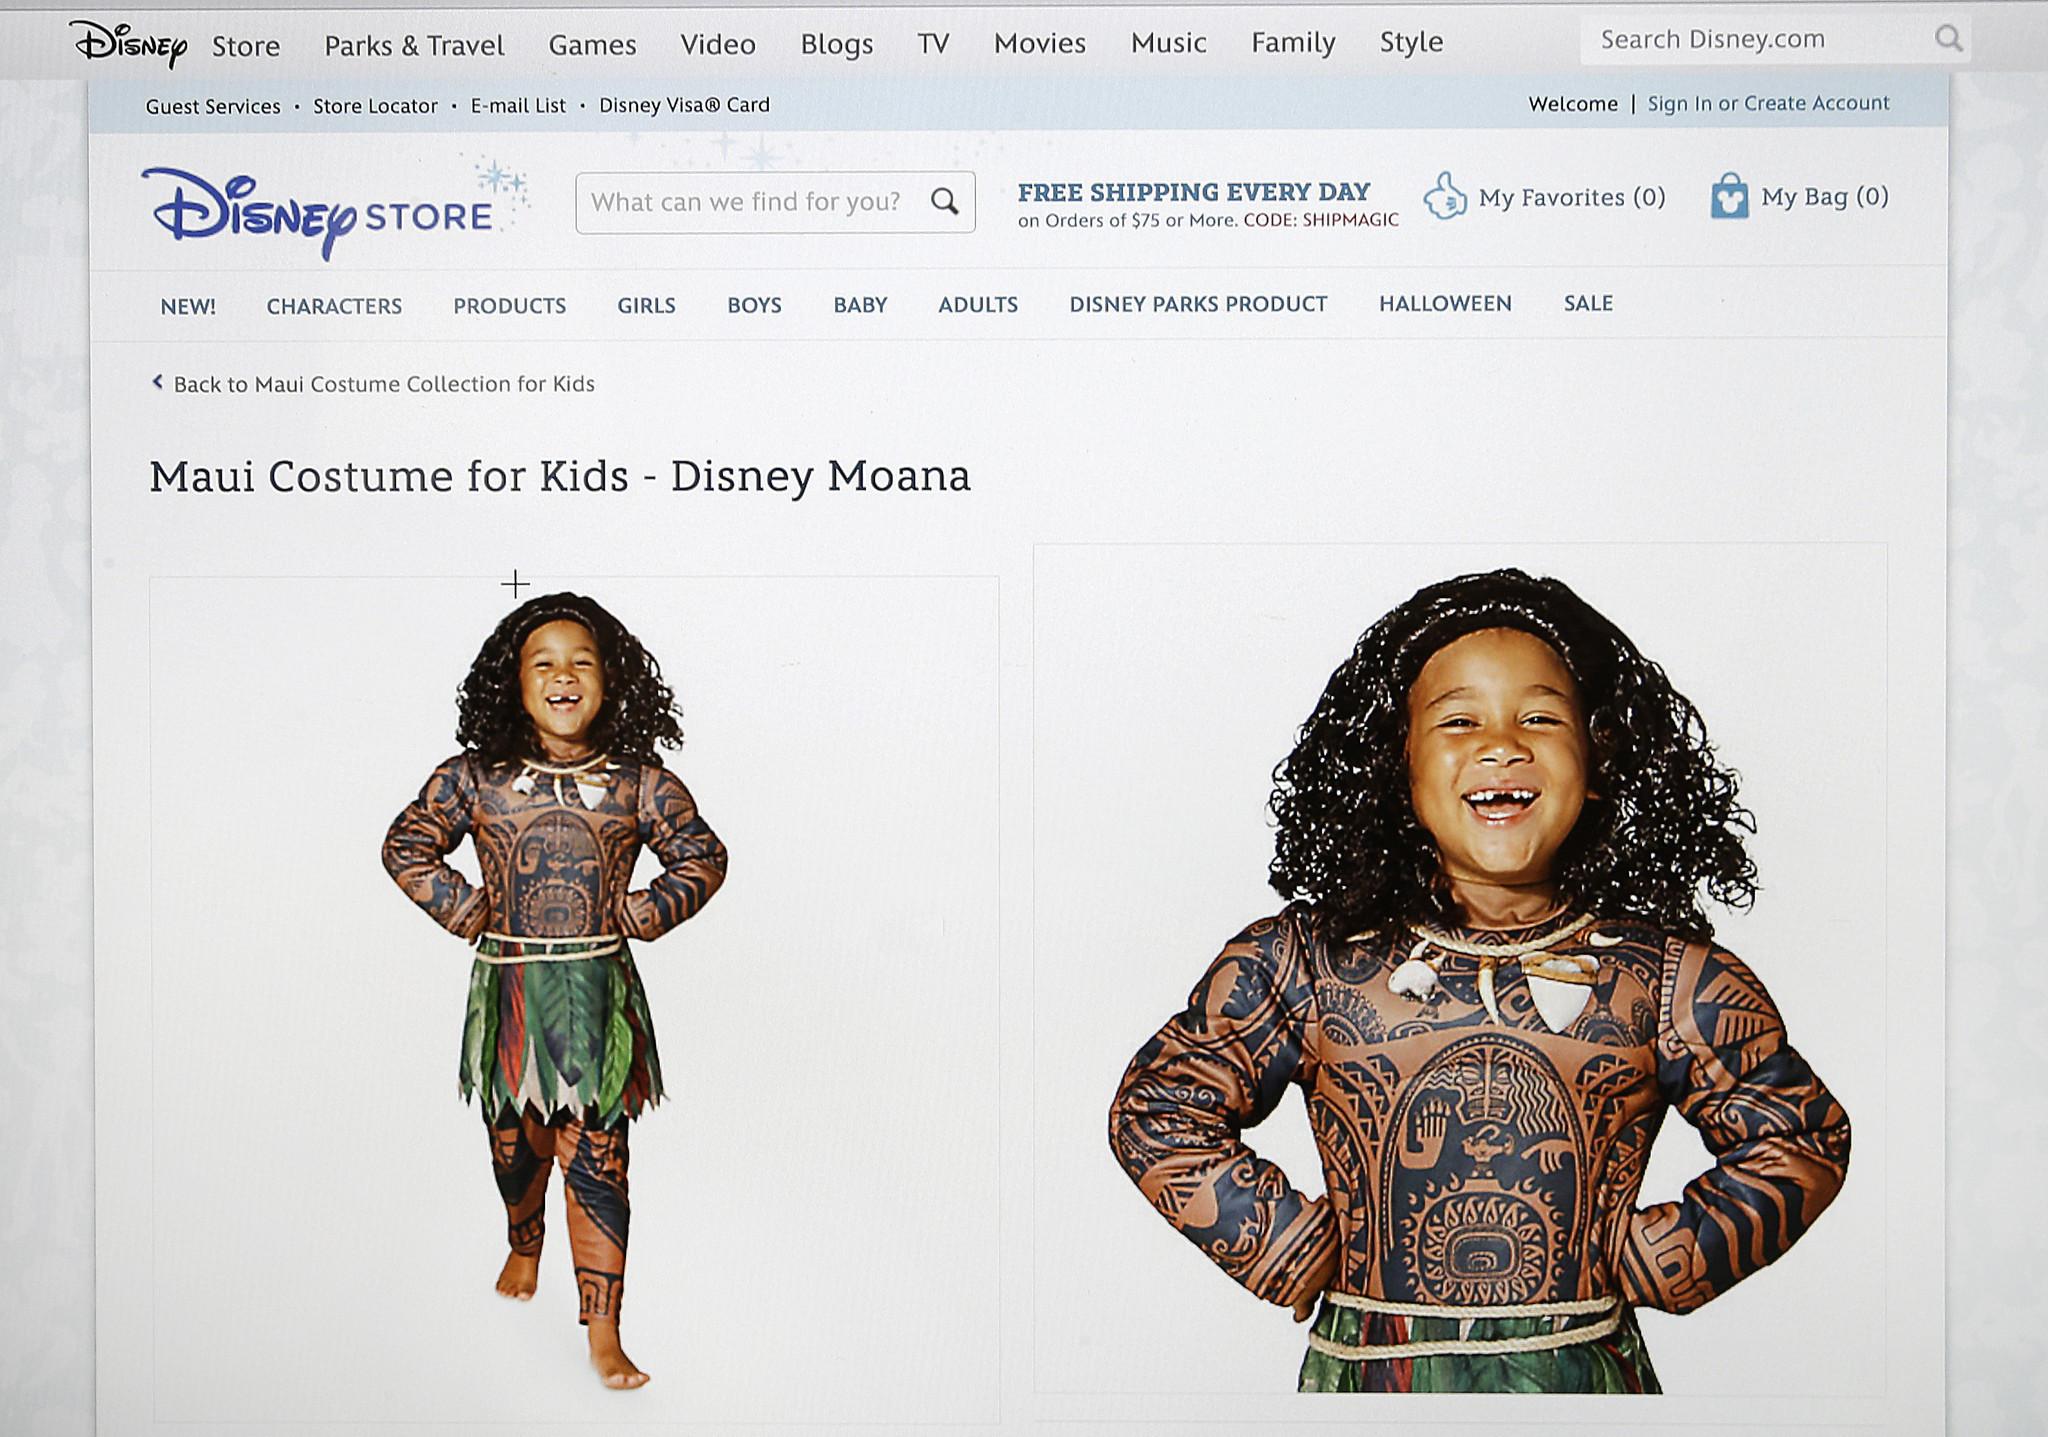 Disney pulls Polynesian costume compared to blackface - The San Diego Union -Tribune